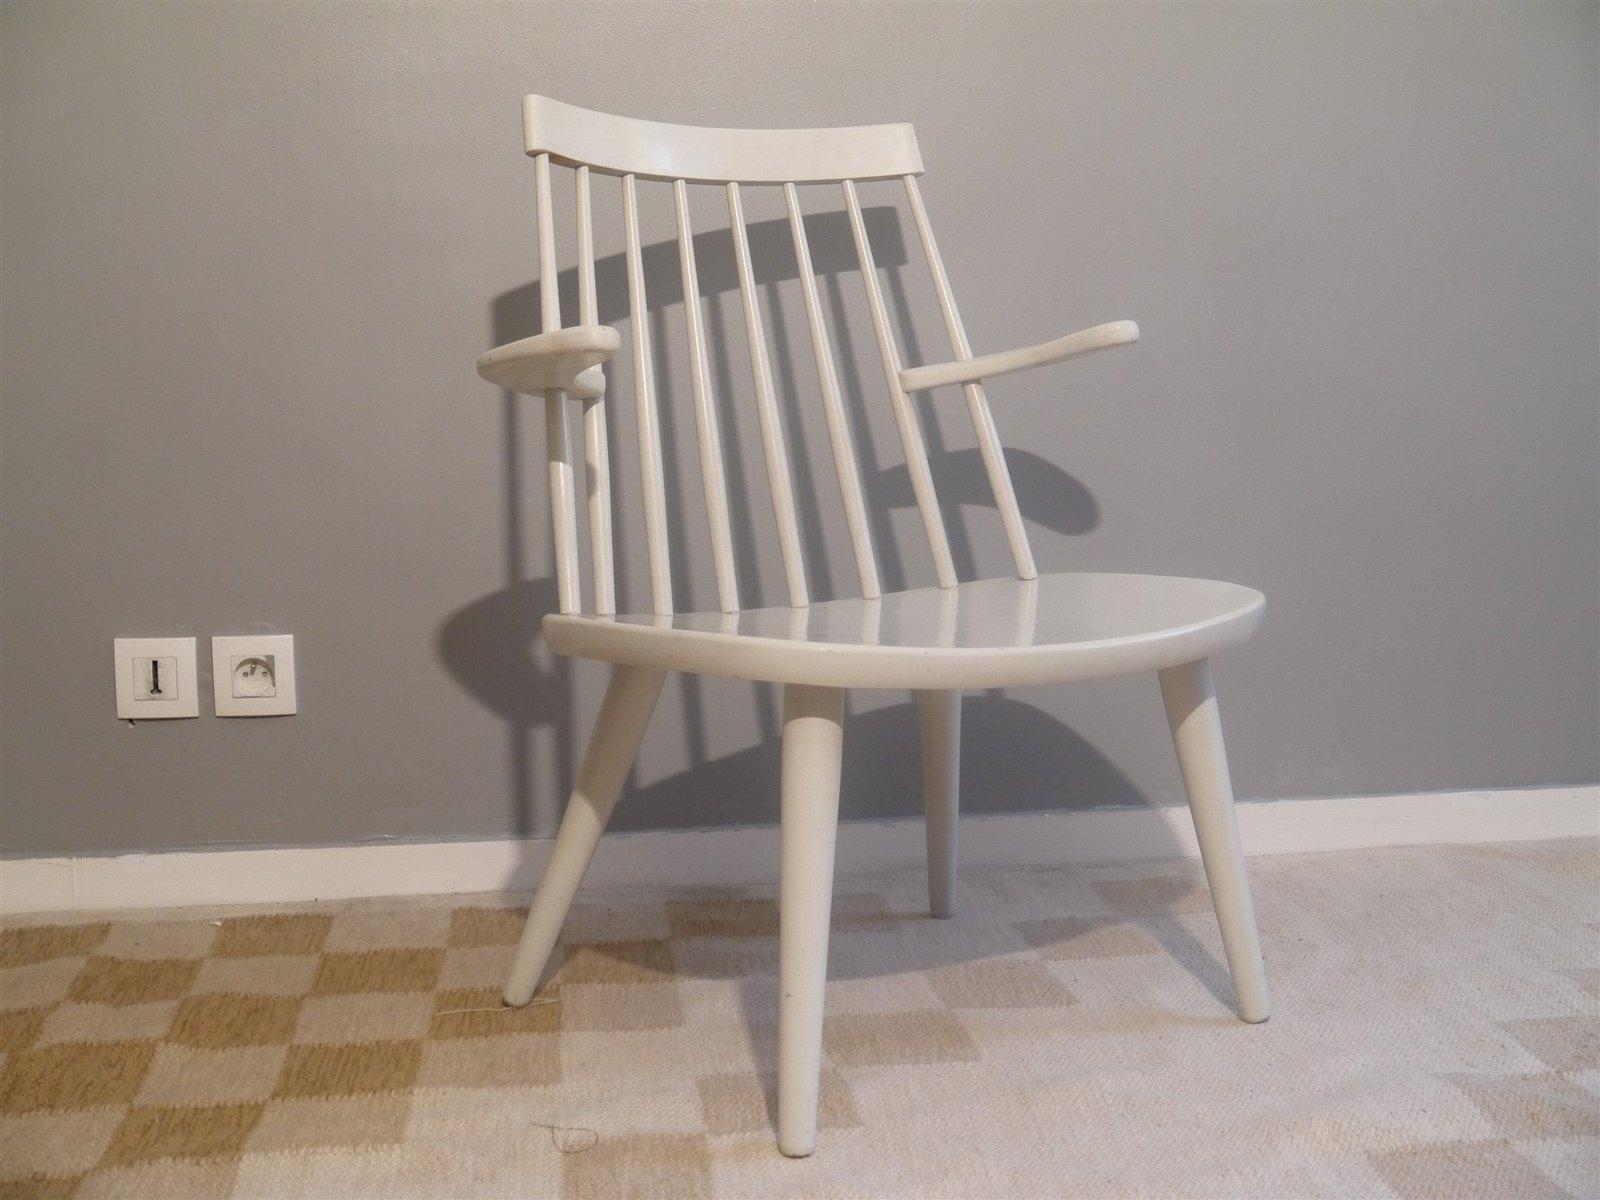 Vintage Sibbo Armchair by Yngve Ekstrom for Stolab, 1950s bei Pamono kaufen